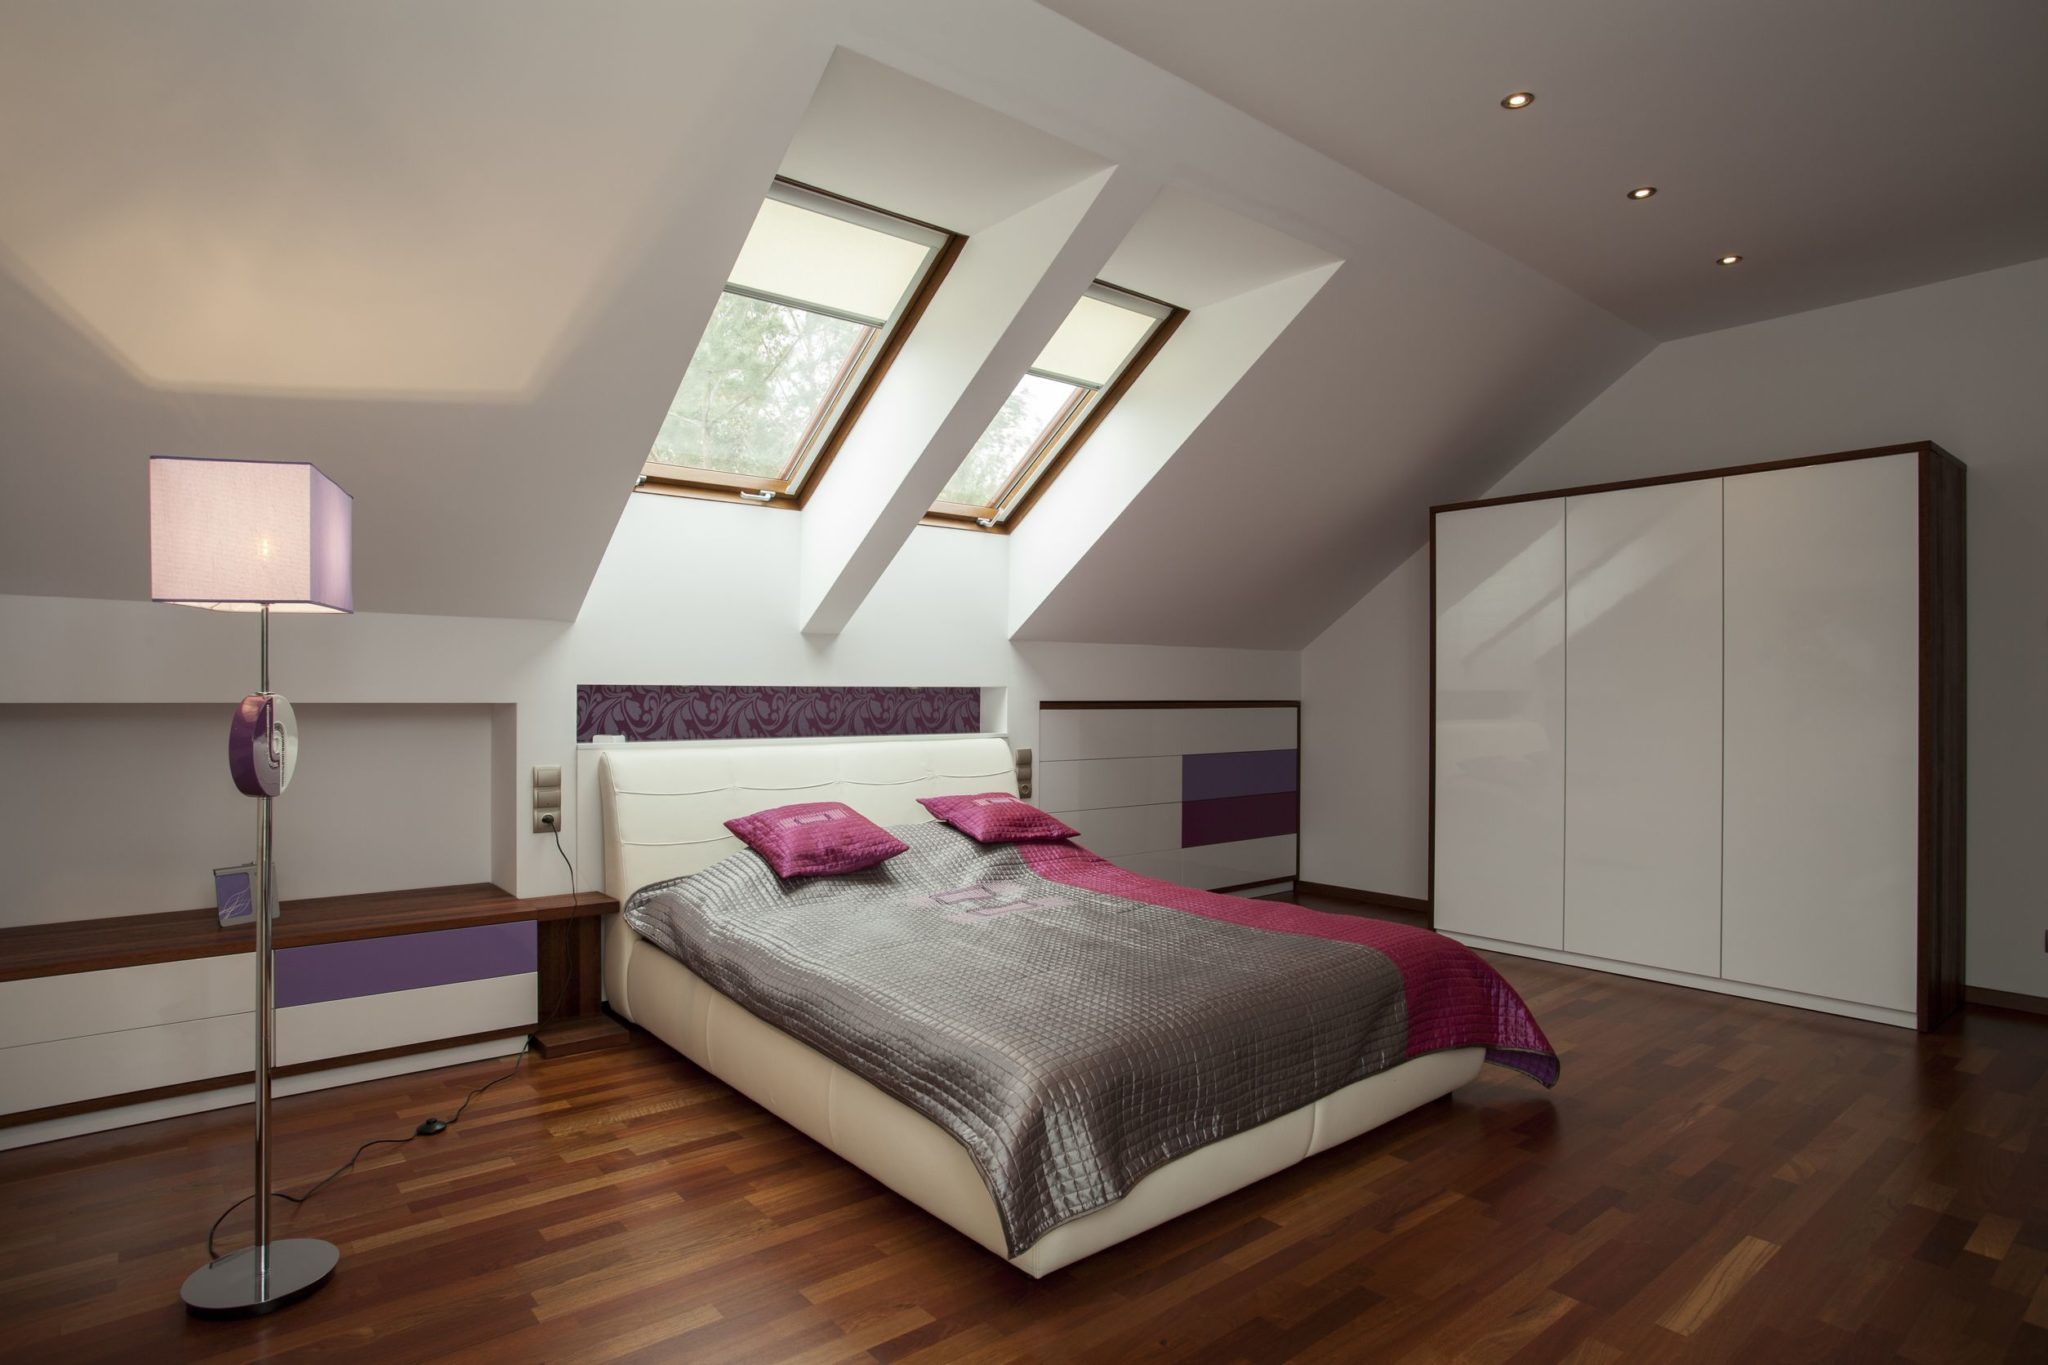 Loft Conversion Bedroom Design Blog Loft Conversions In Surrey Taylord Loft Conversions Ltd